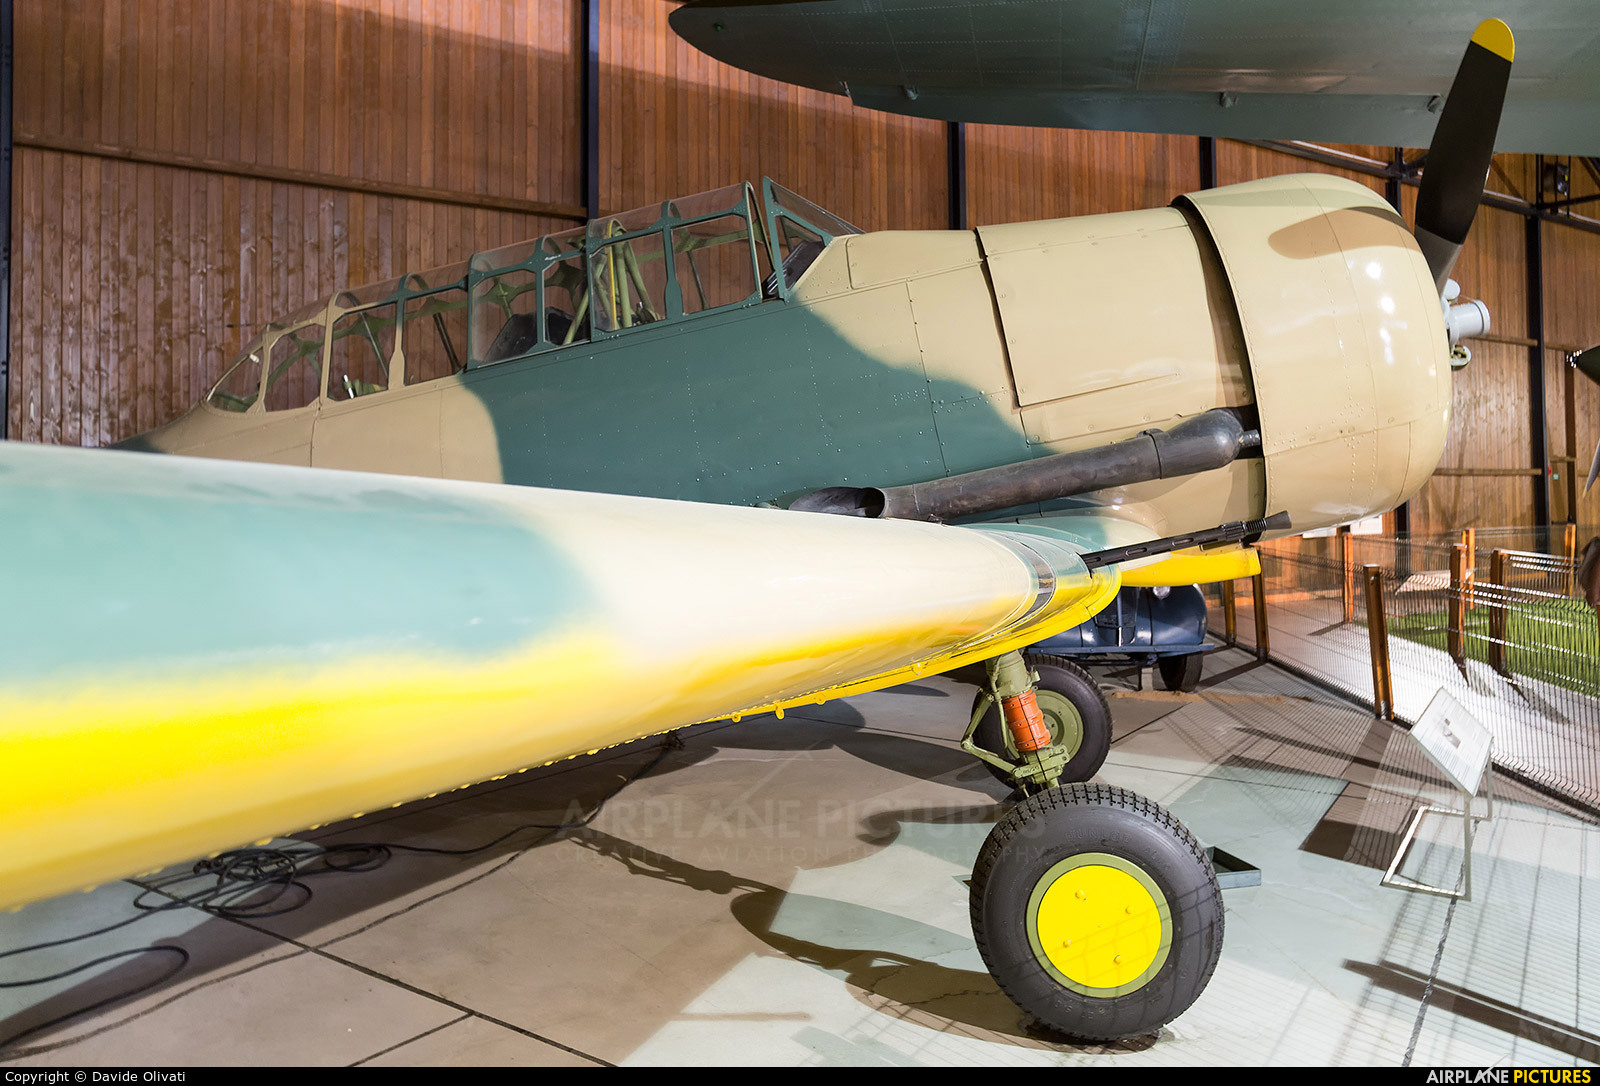 Royal Air Force FT422 aircraft at Prague - Kbely, Letecké muzeum